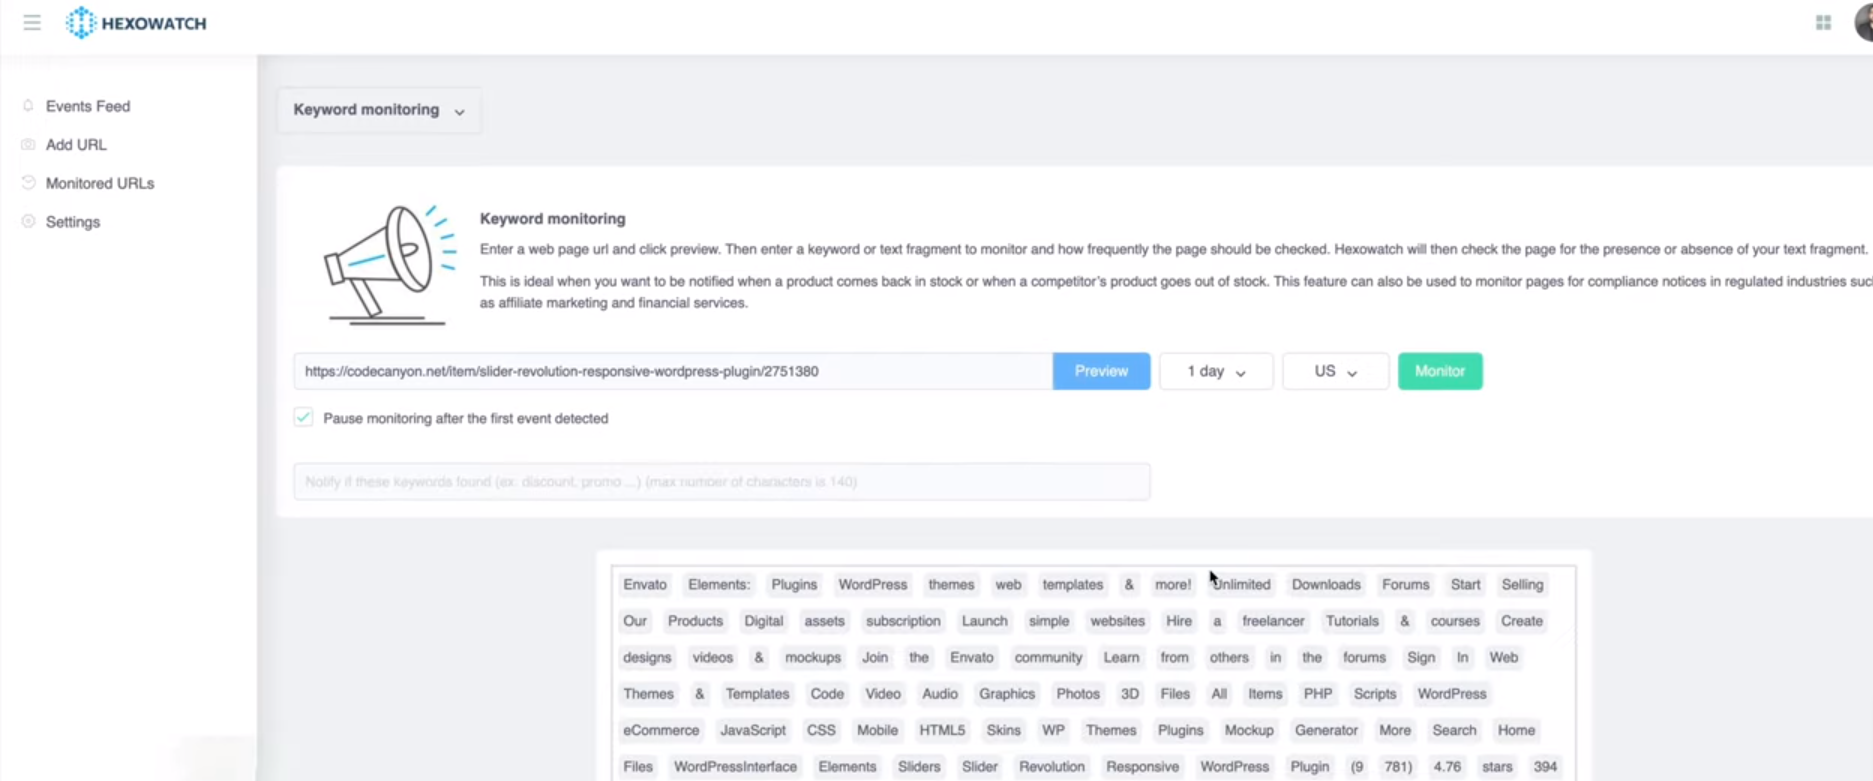 Hexowatch keyword monitoring